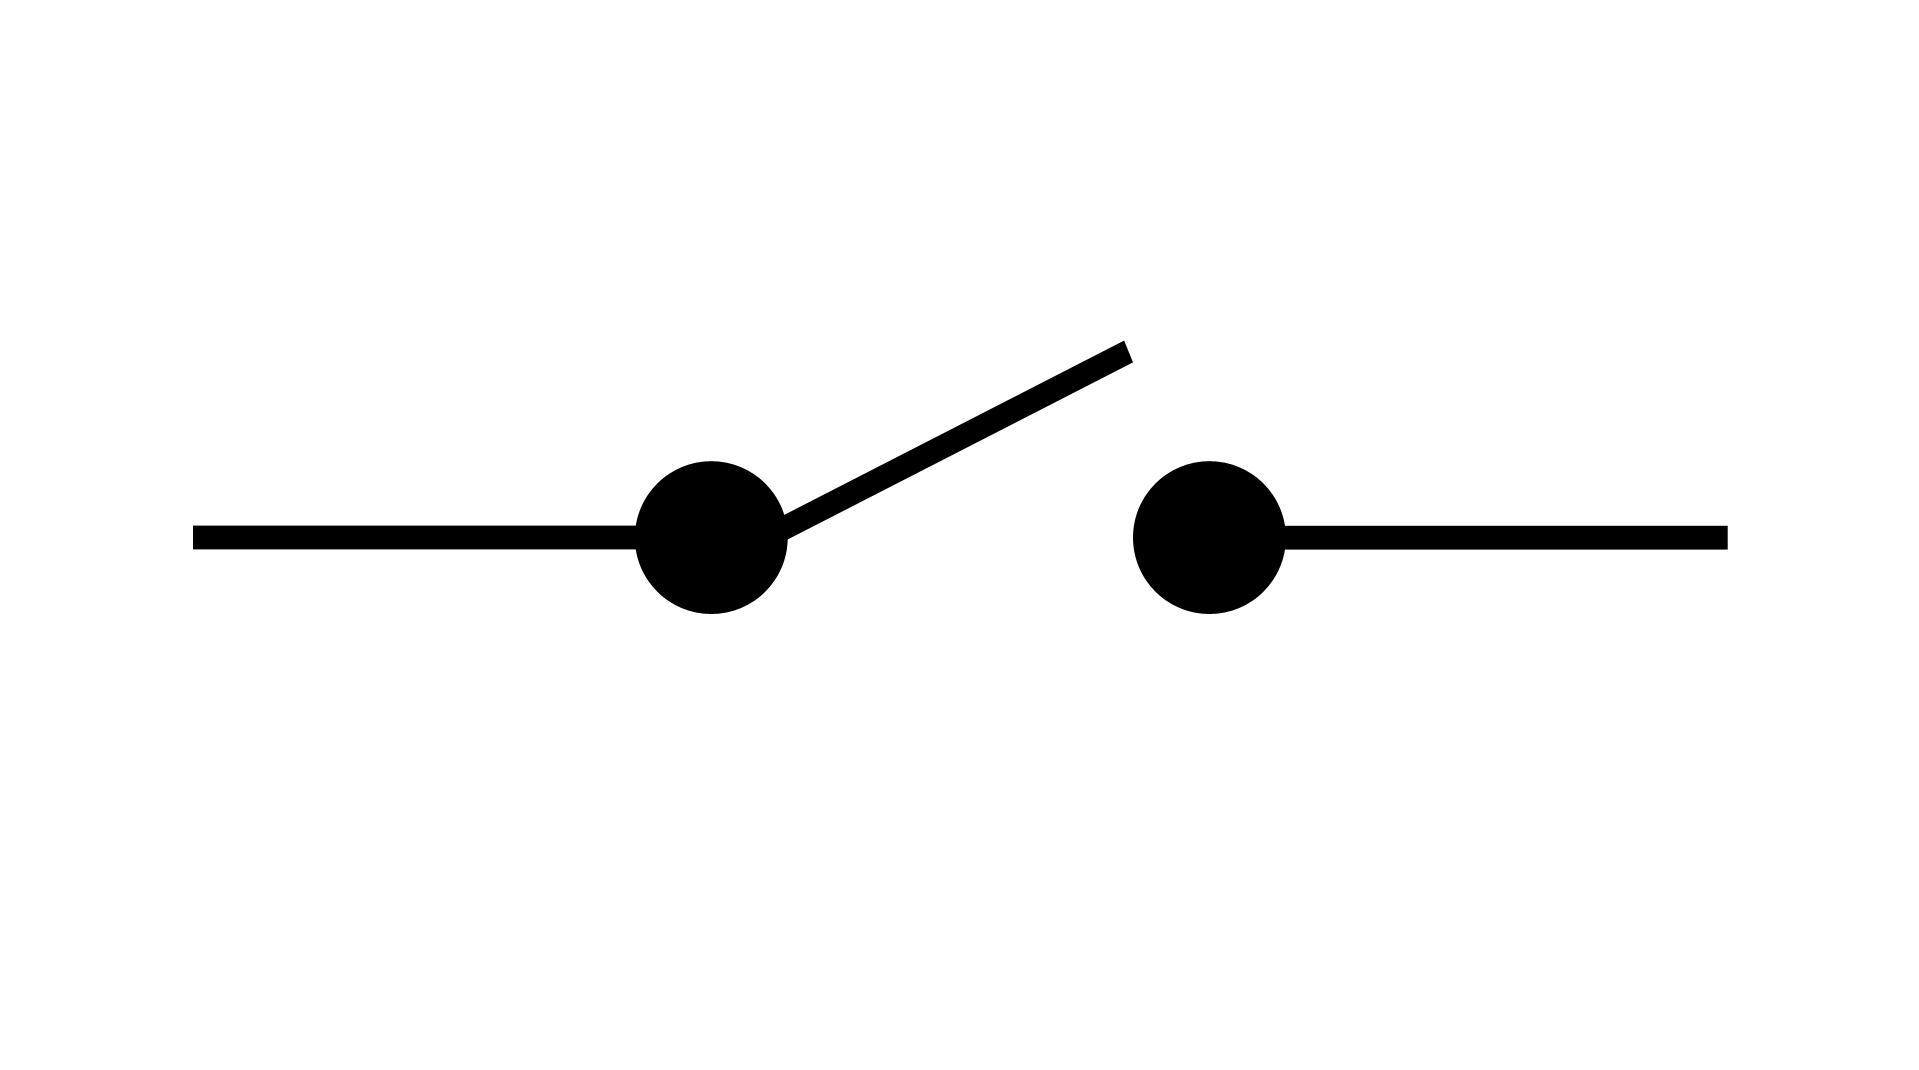 Schema electrique symbole lampe